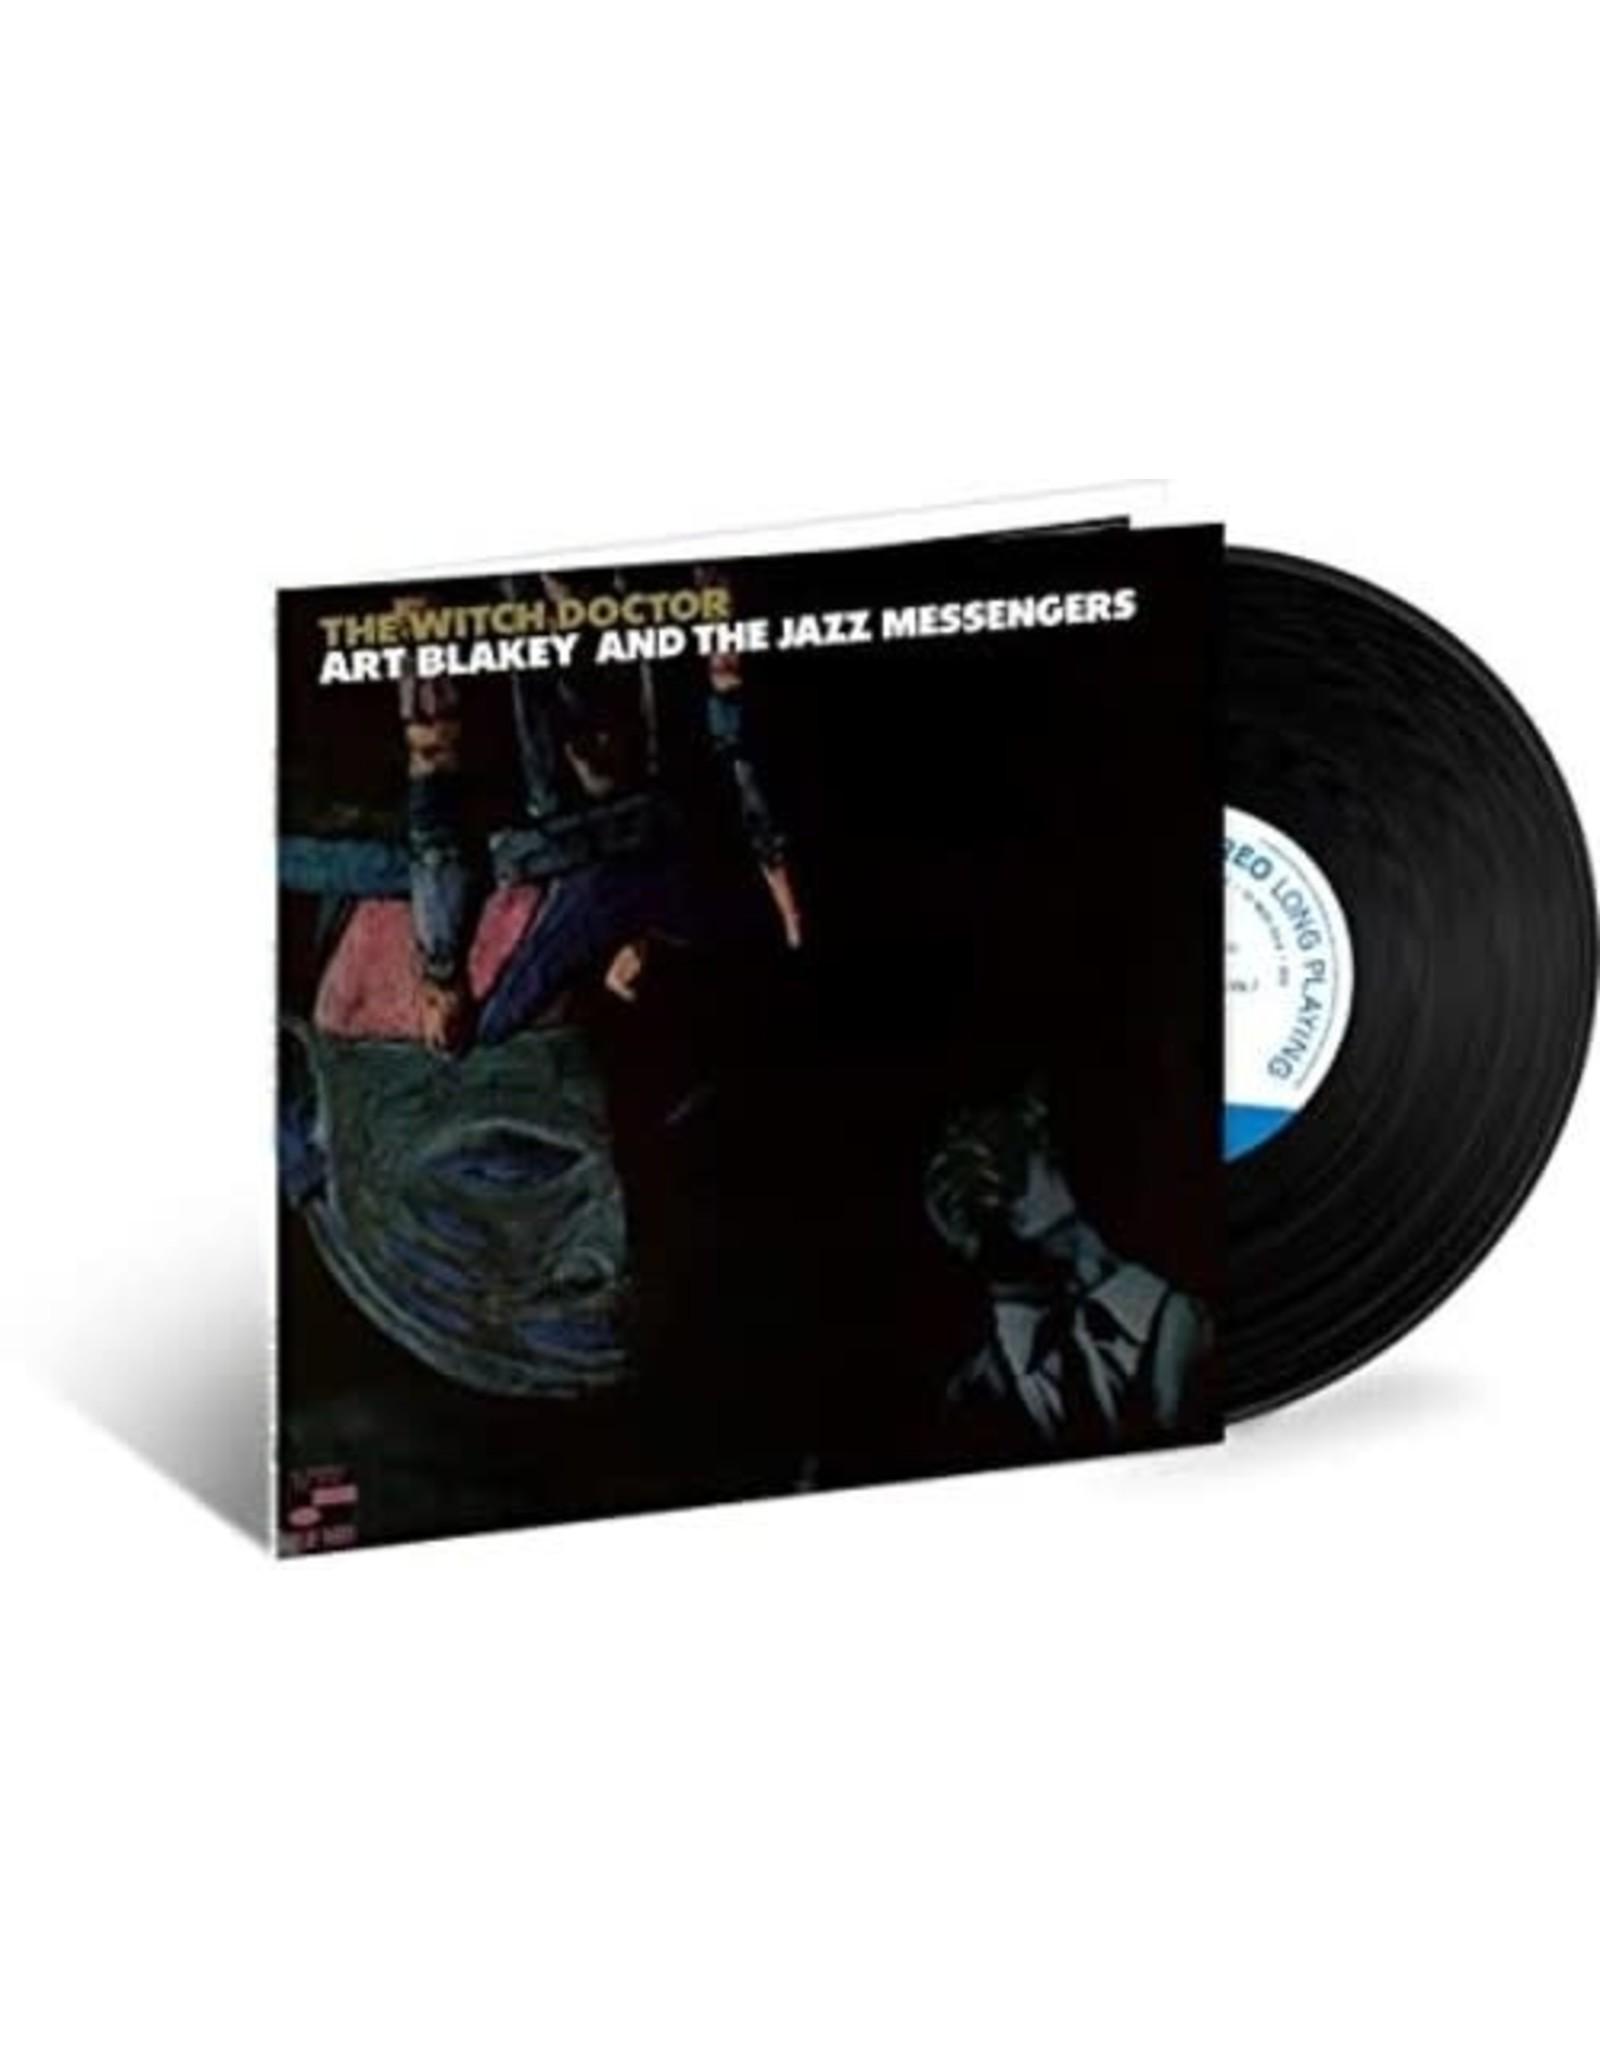 New Vinyl Art Blakey & The Jazz Messengers - Witch Doctor (Blue Note Tone Poet Series) LP